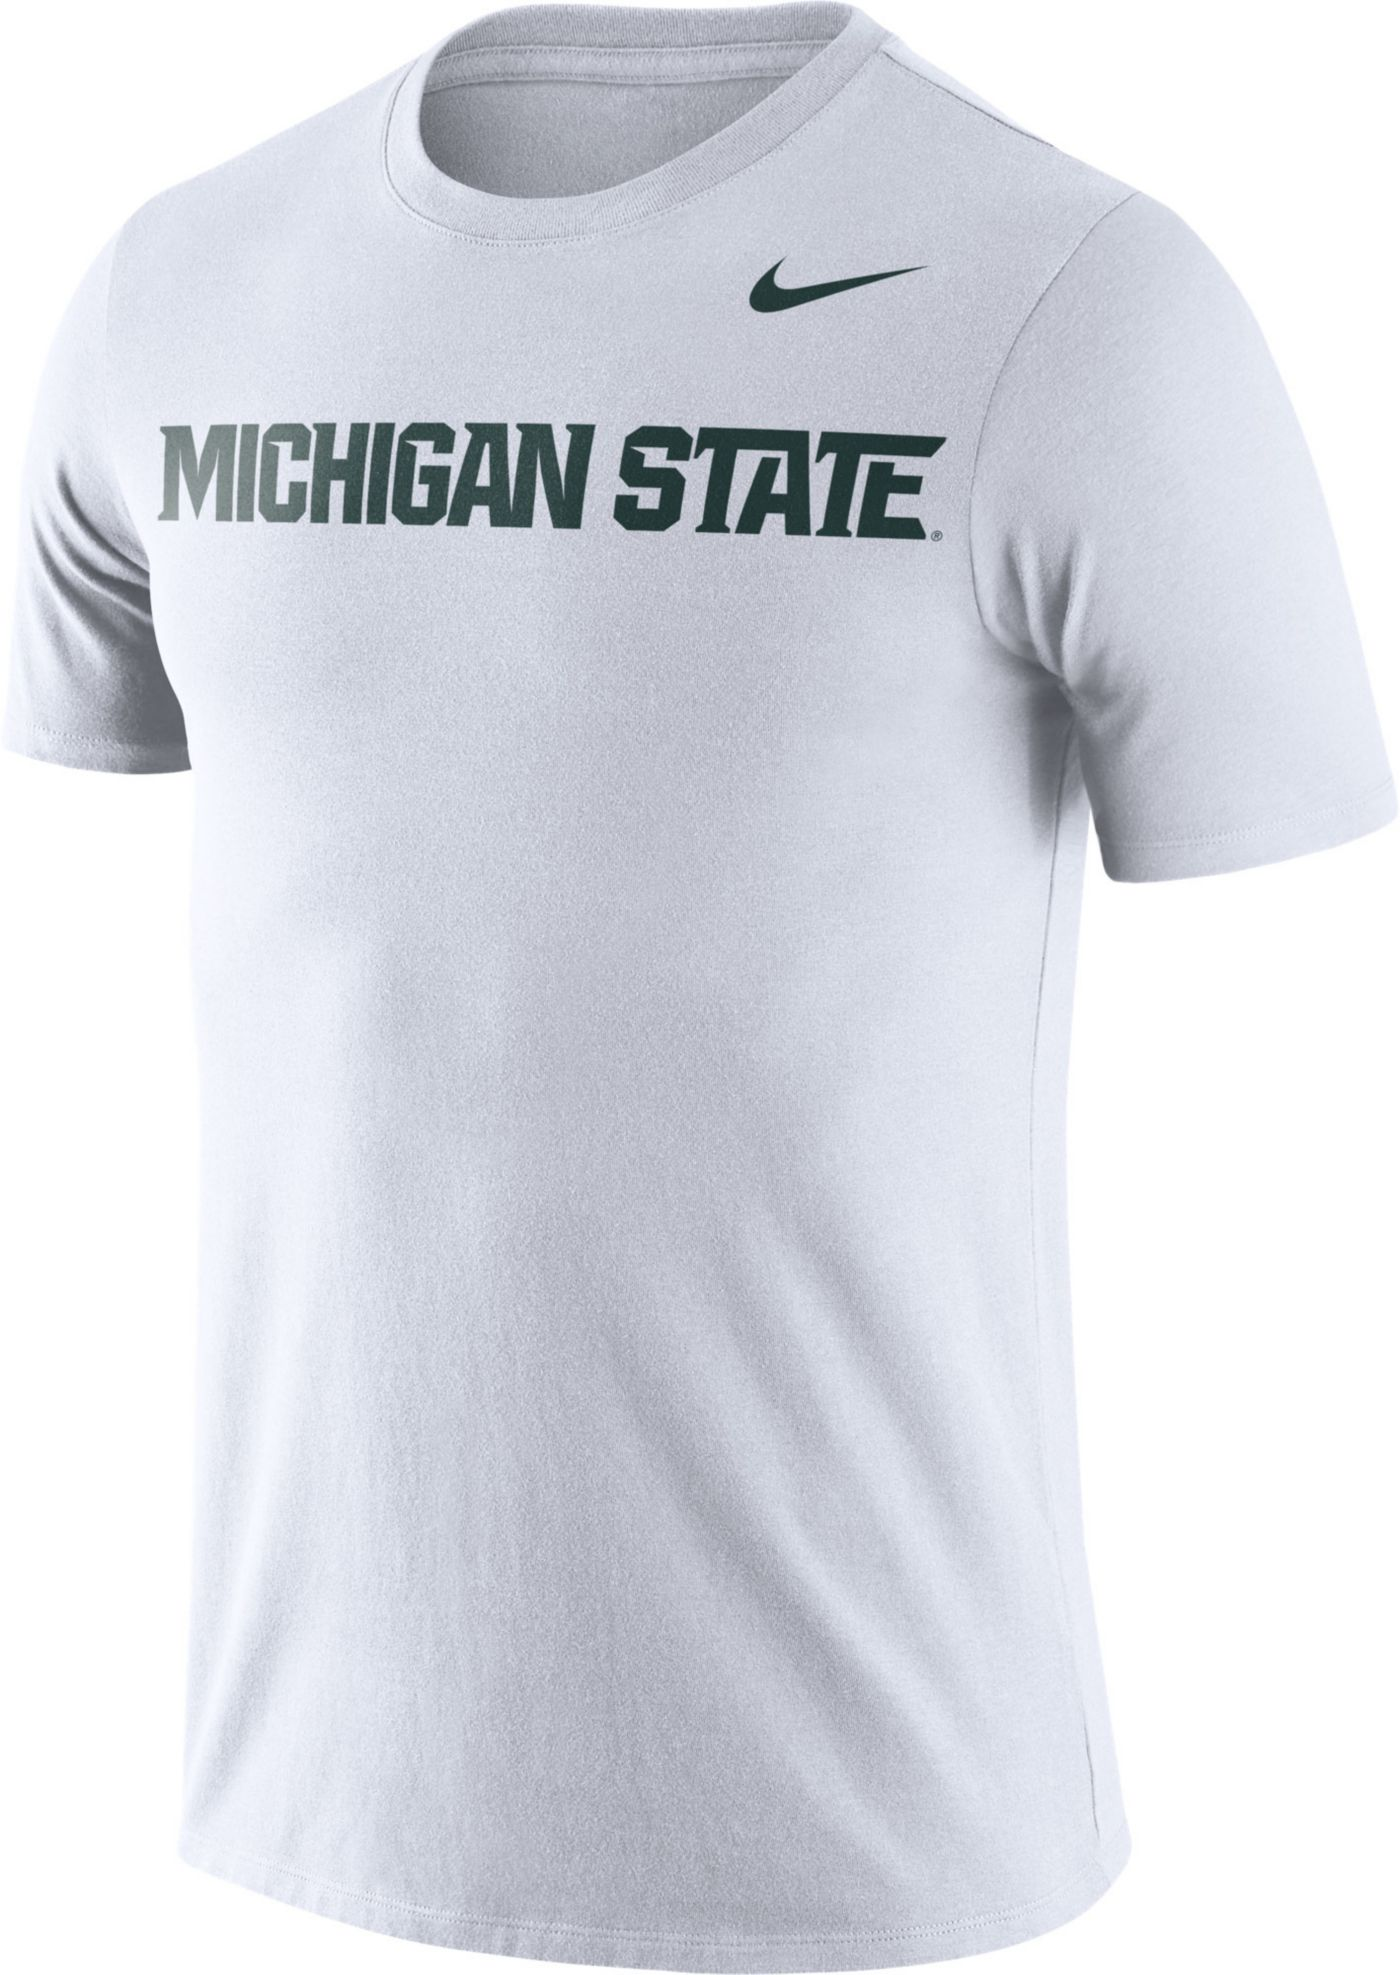 Nike Men's Michigan State Spartans Dri-FIT Cotton Word White T-Shirt